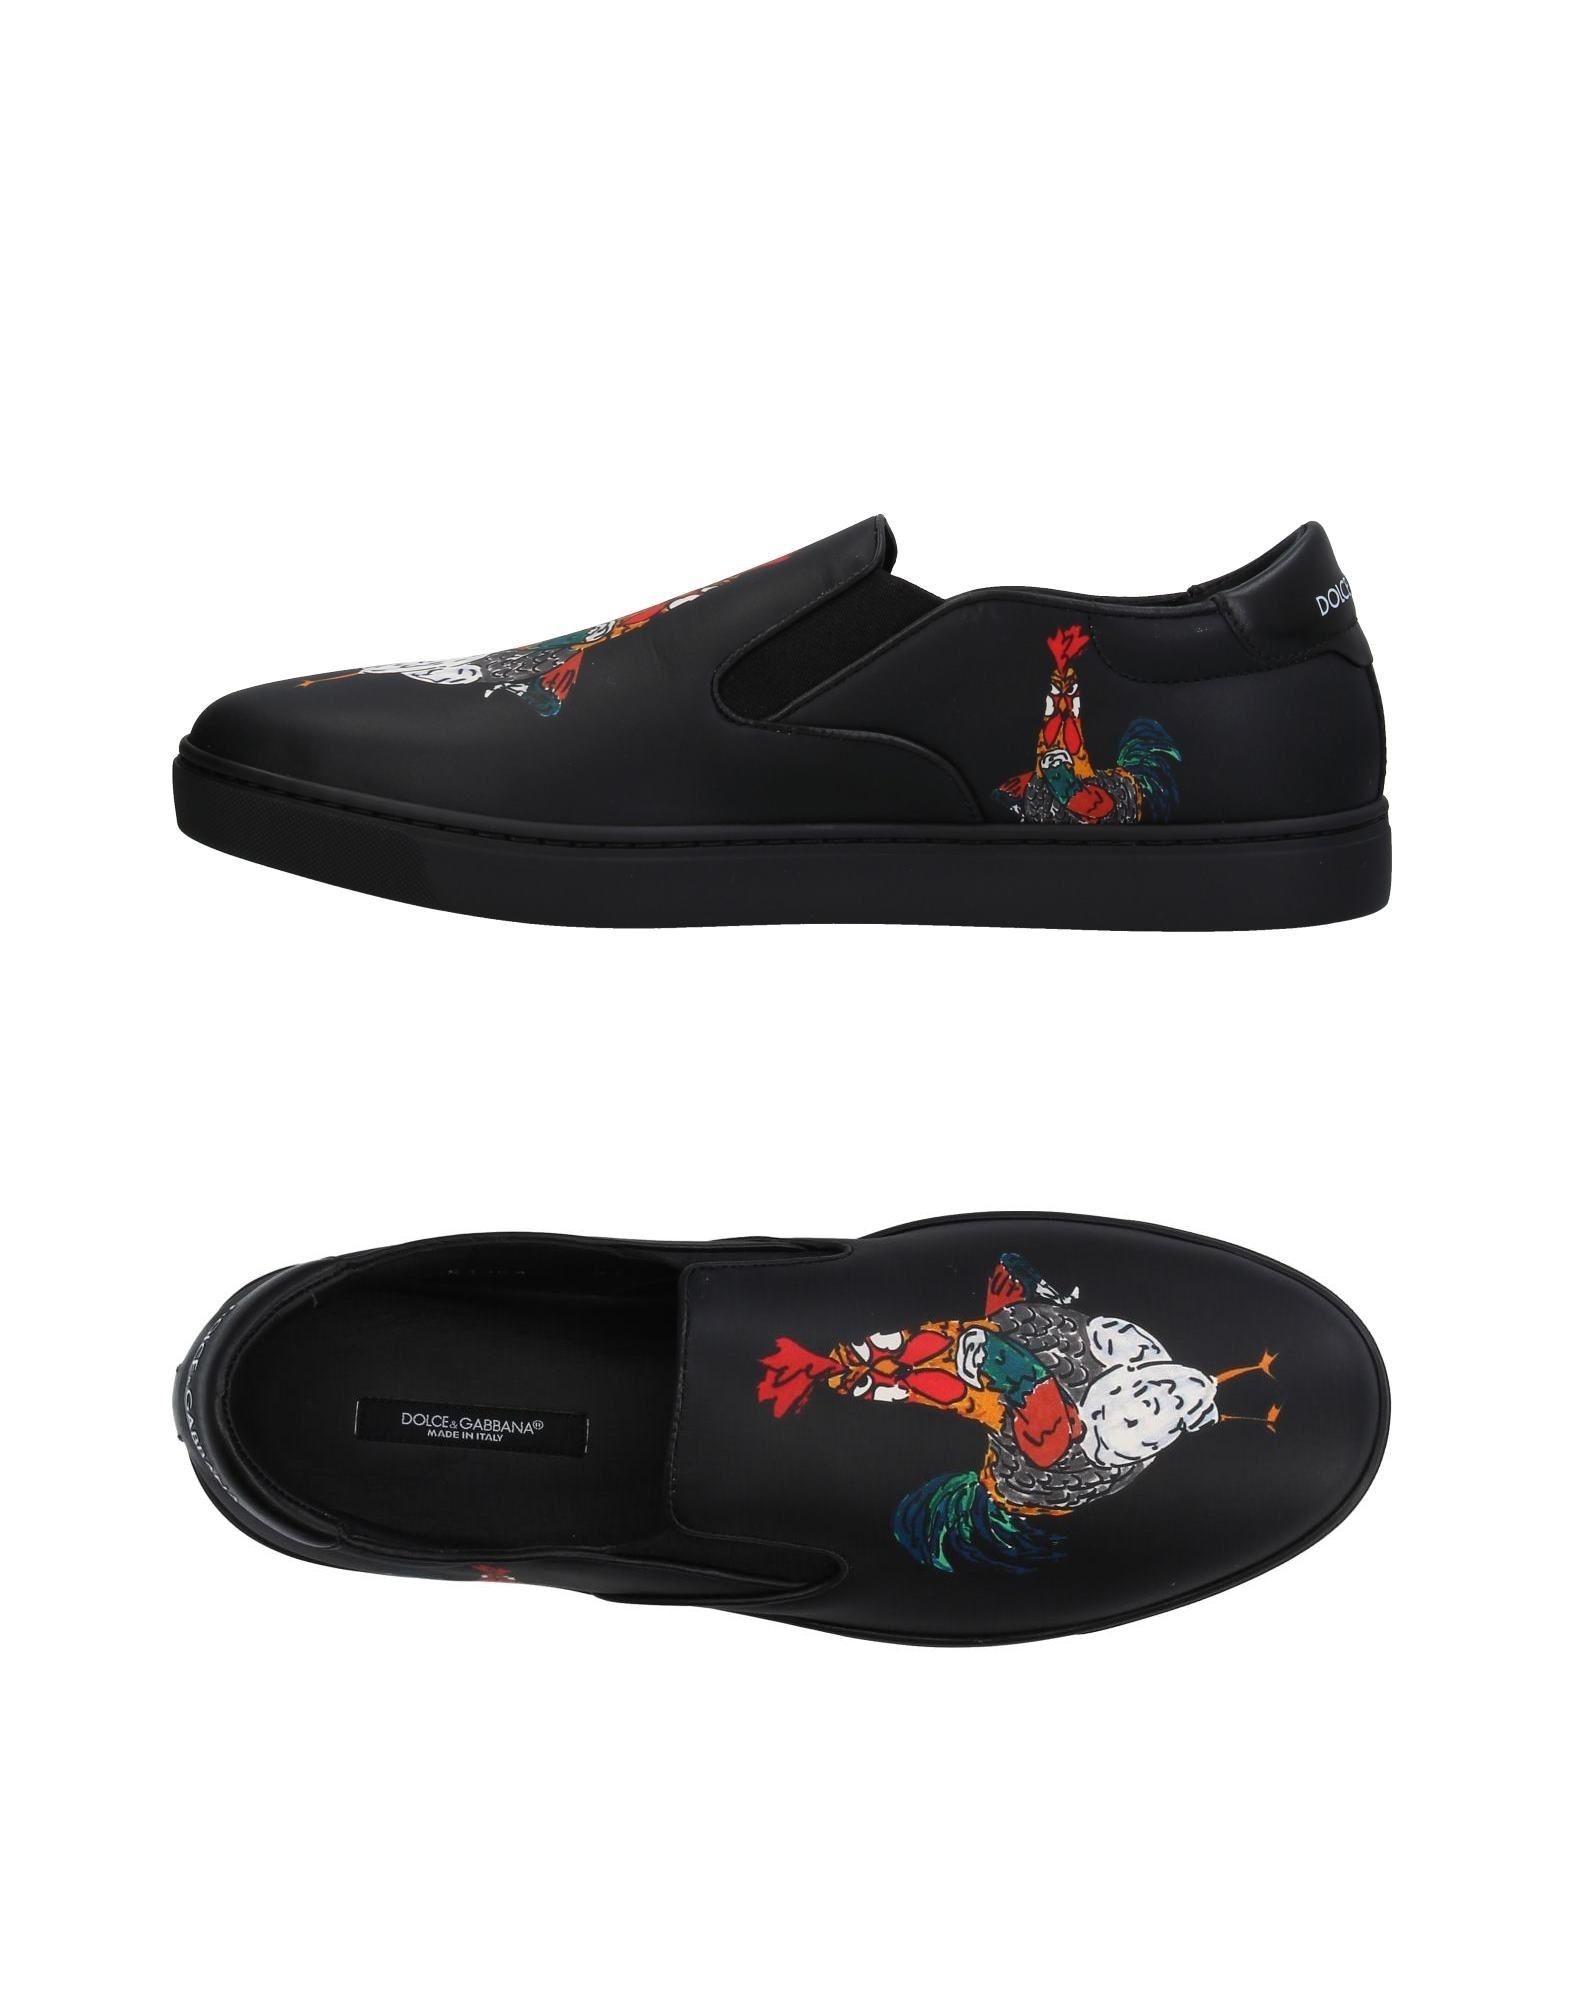 Dolce Dolce Dolce & Gabbana Sneakers - Men Dolce & Gabbana Sneakers online on  United Kingdom - 11393129GP 21698f